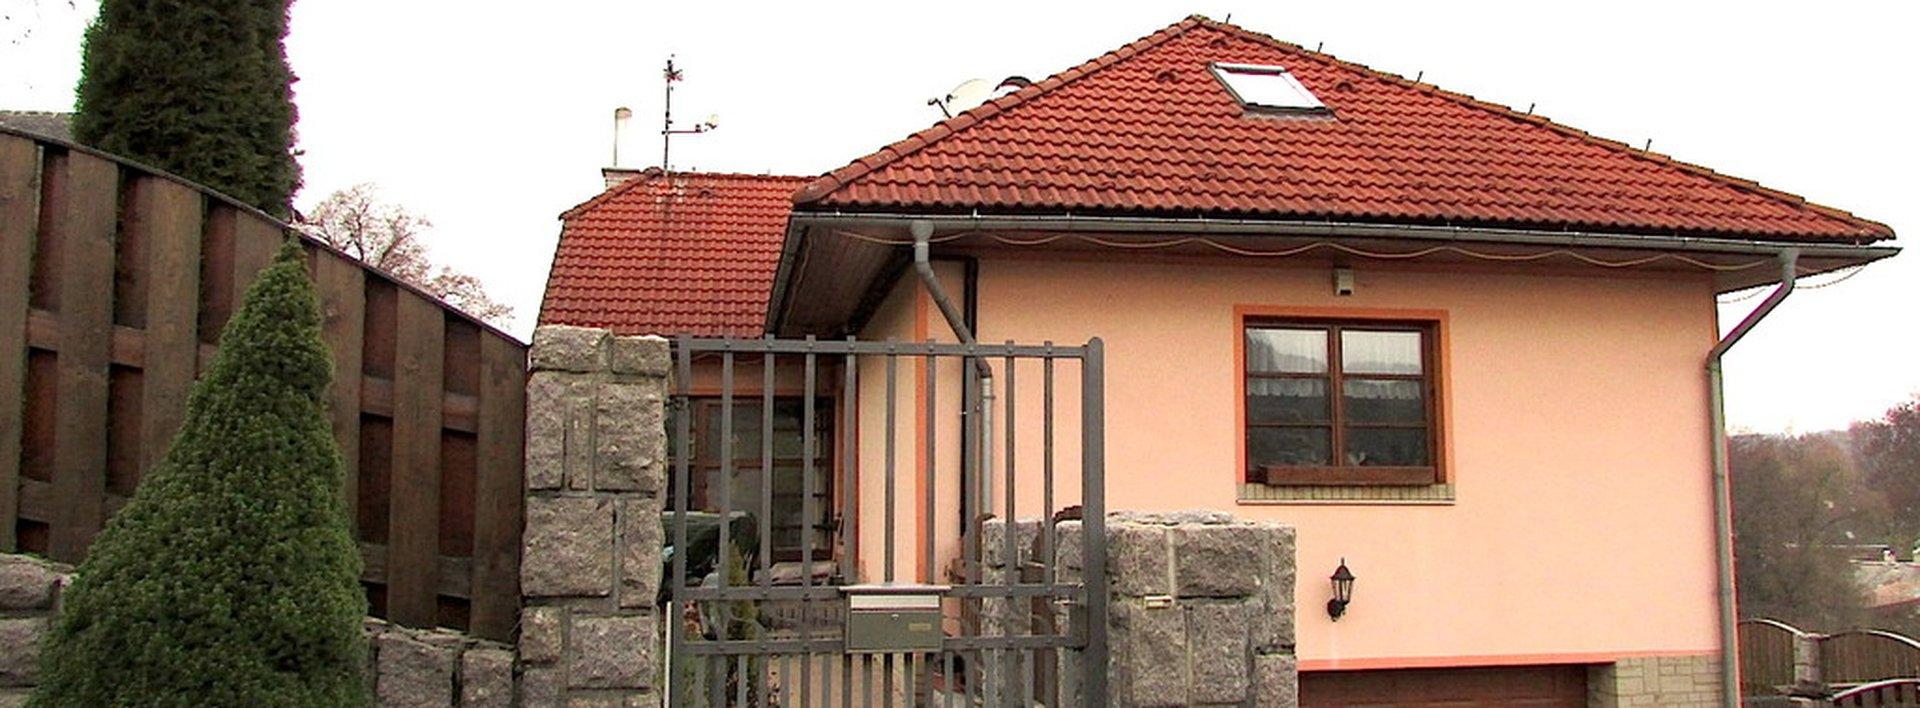 Prodej rodinného domu se zahradou a bazénem - Rychnov/Pulečný, Ev.č.: N47491